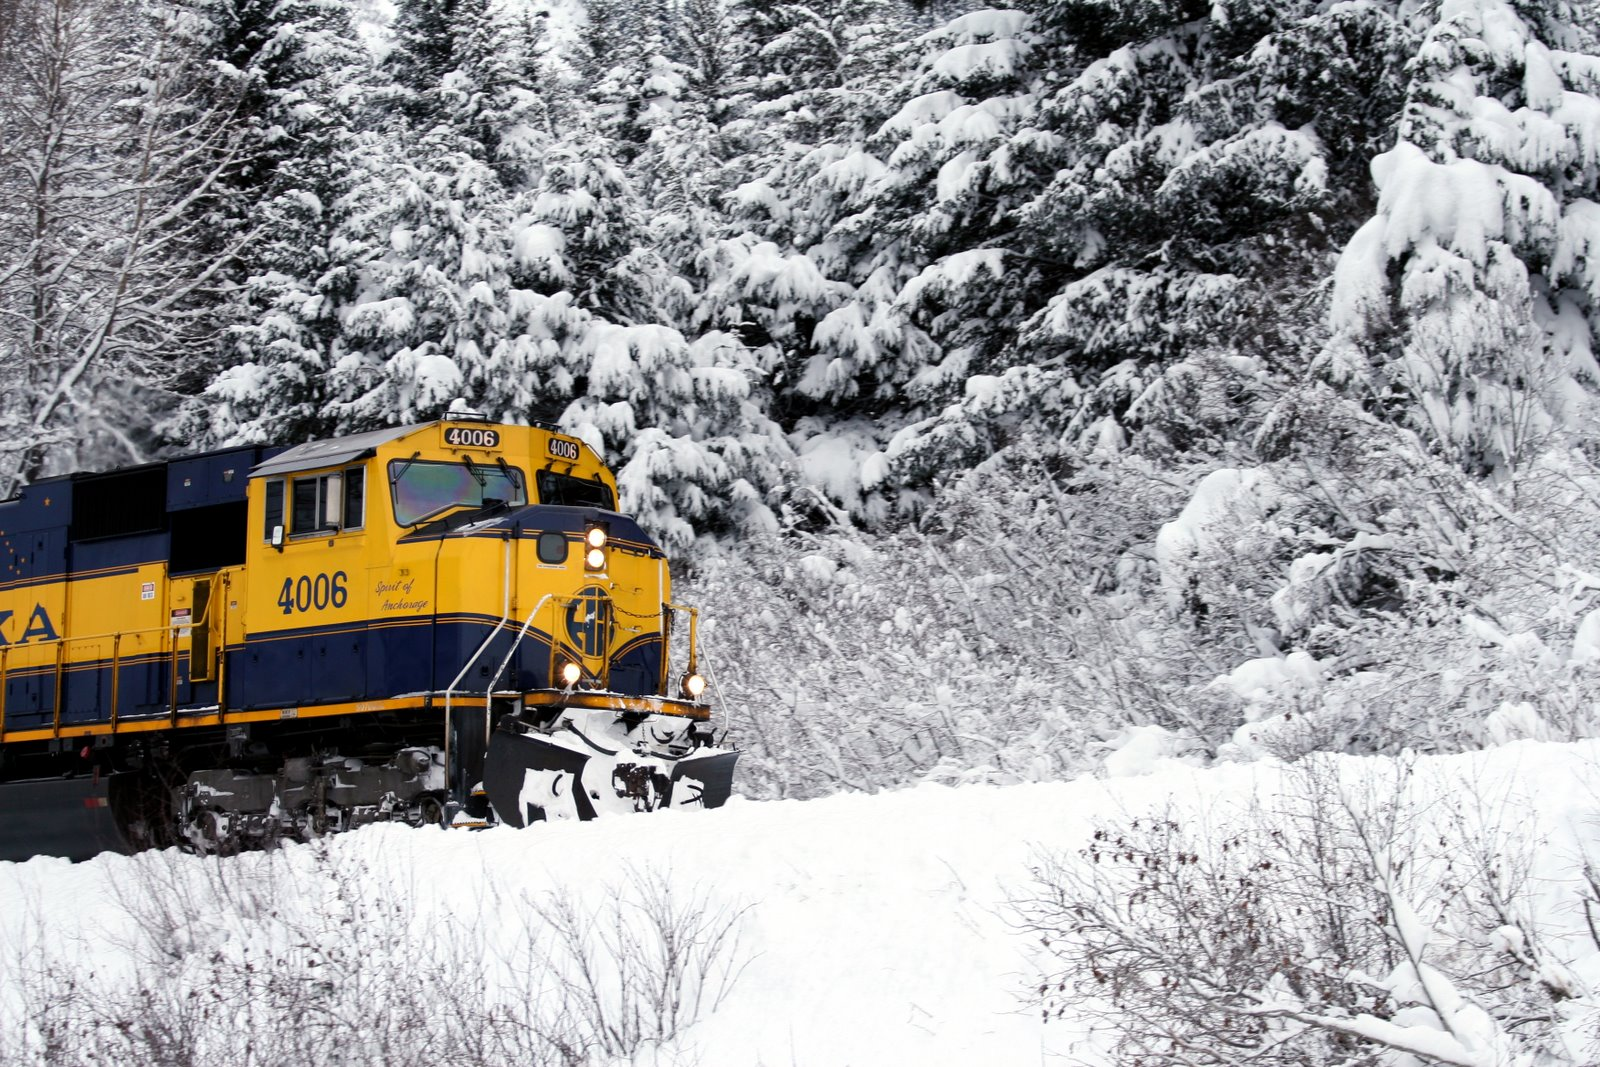 Alaska train toys